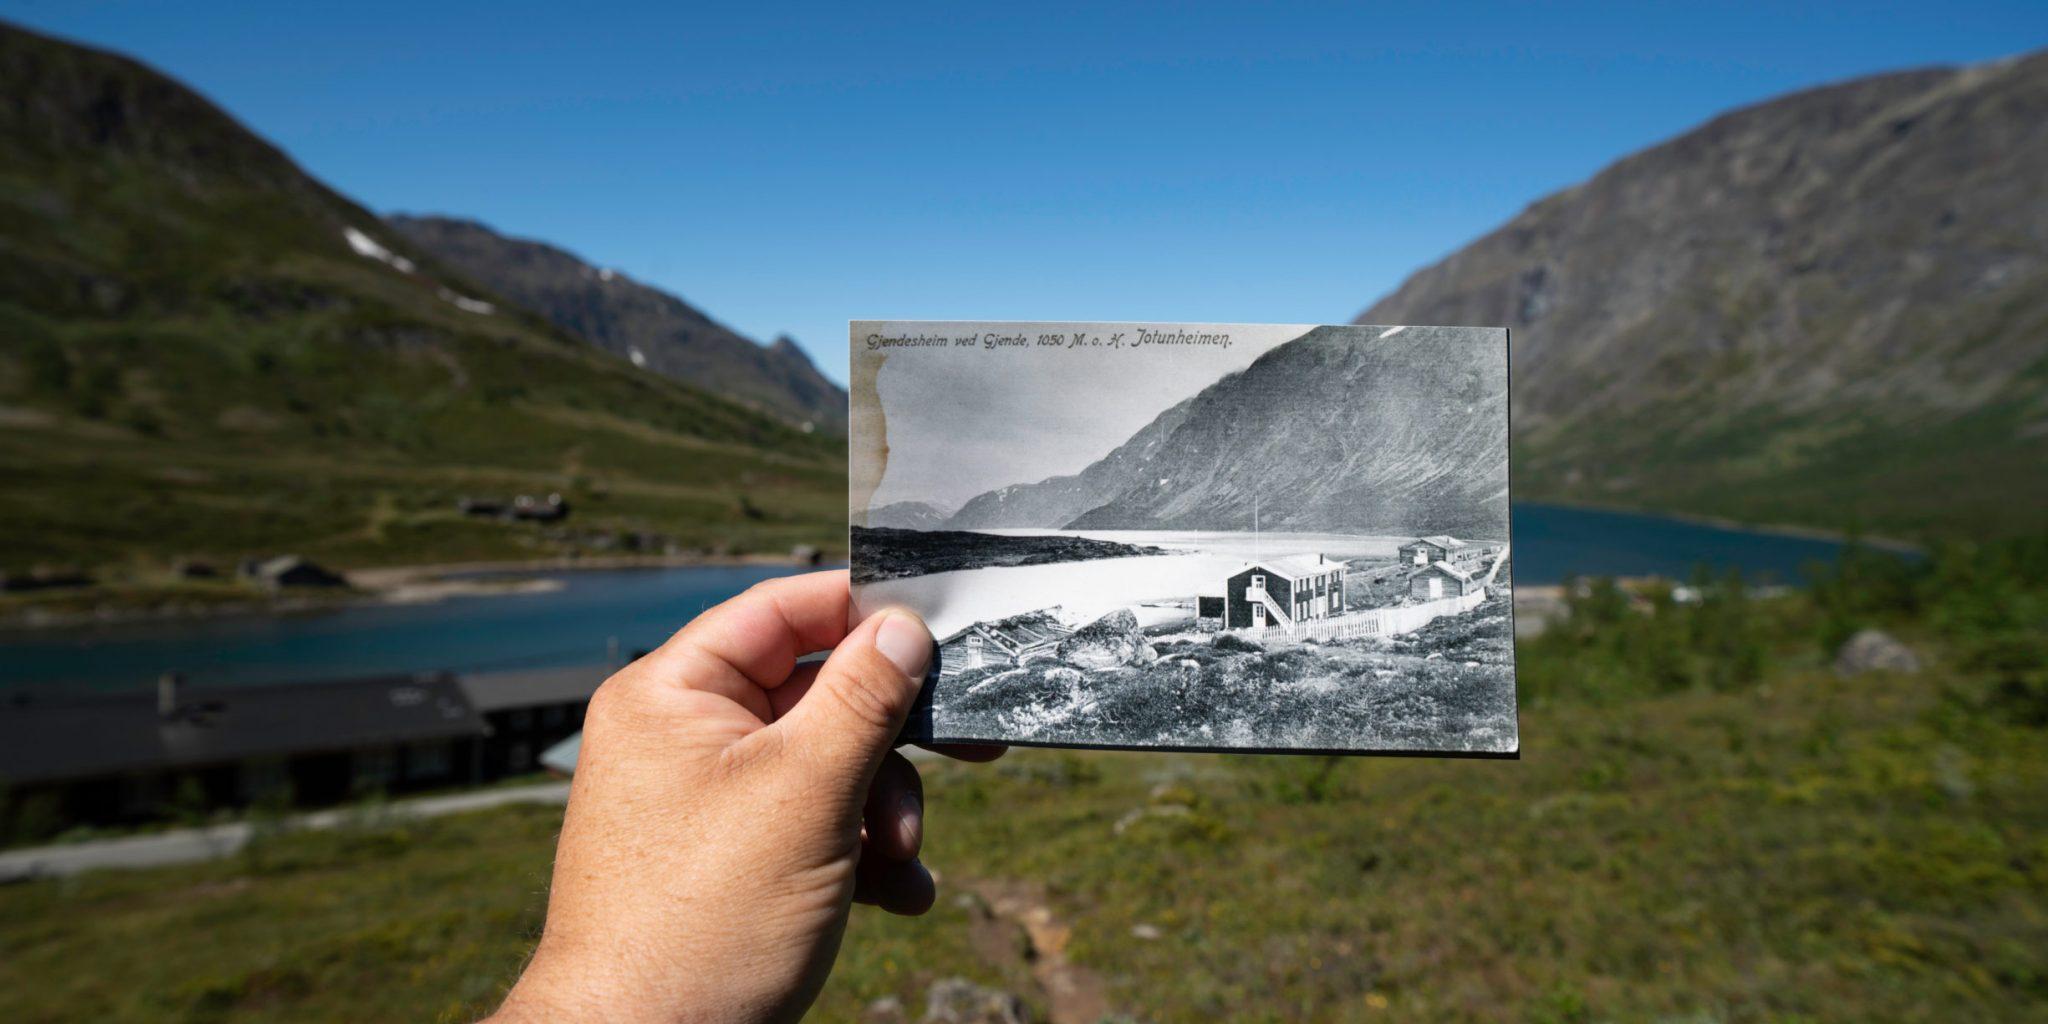 Historical Route Jotunheimen ©Yngve Ask